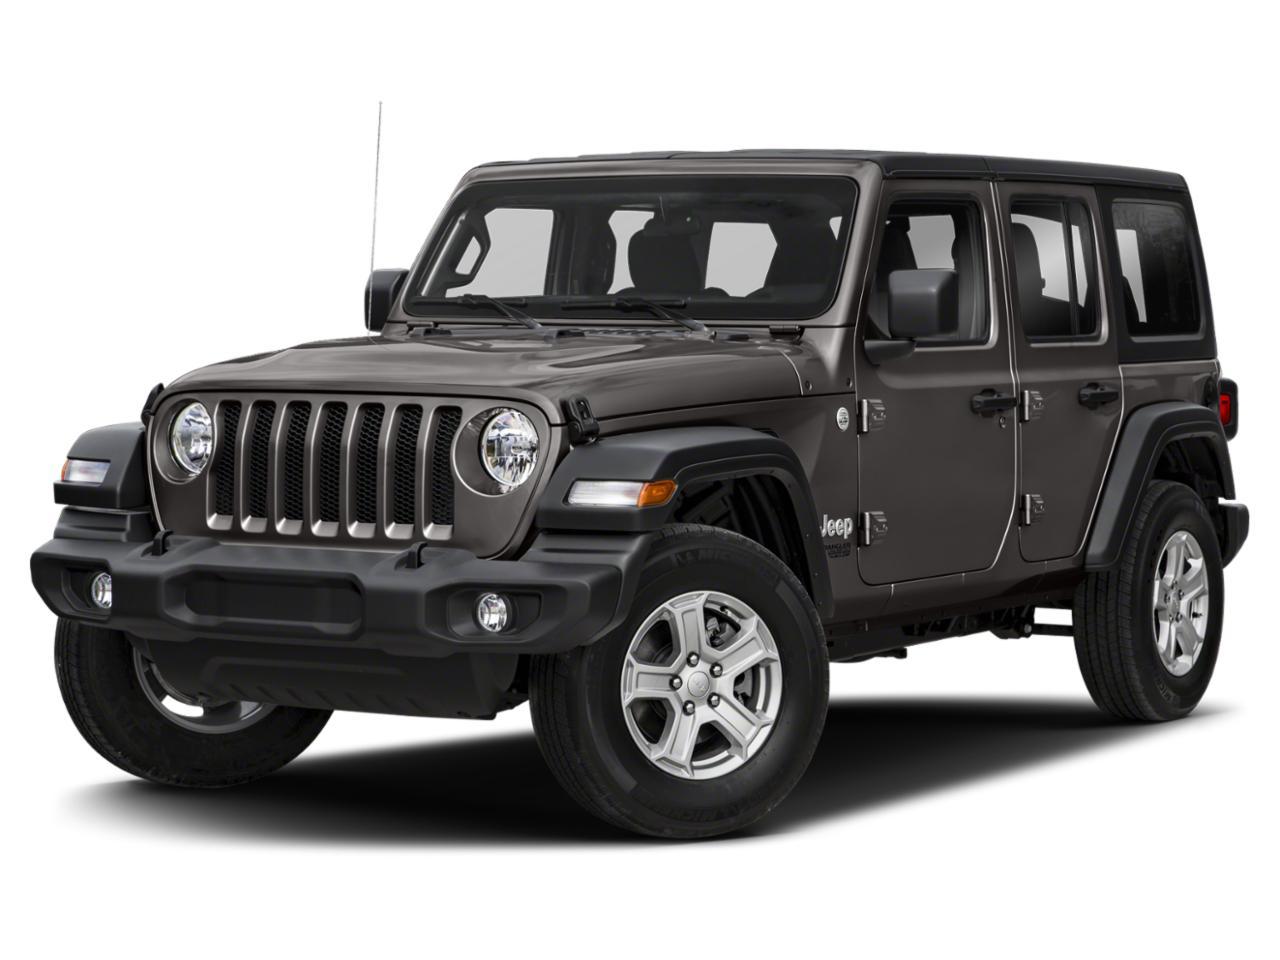 2020 Jeep Wrangler UNLIMITED Convertible Slide